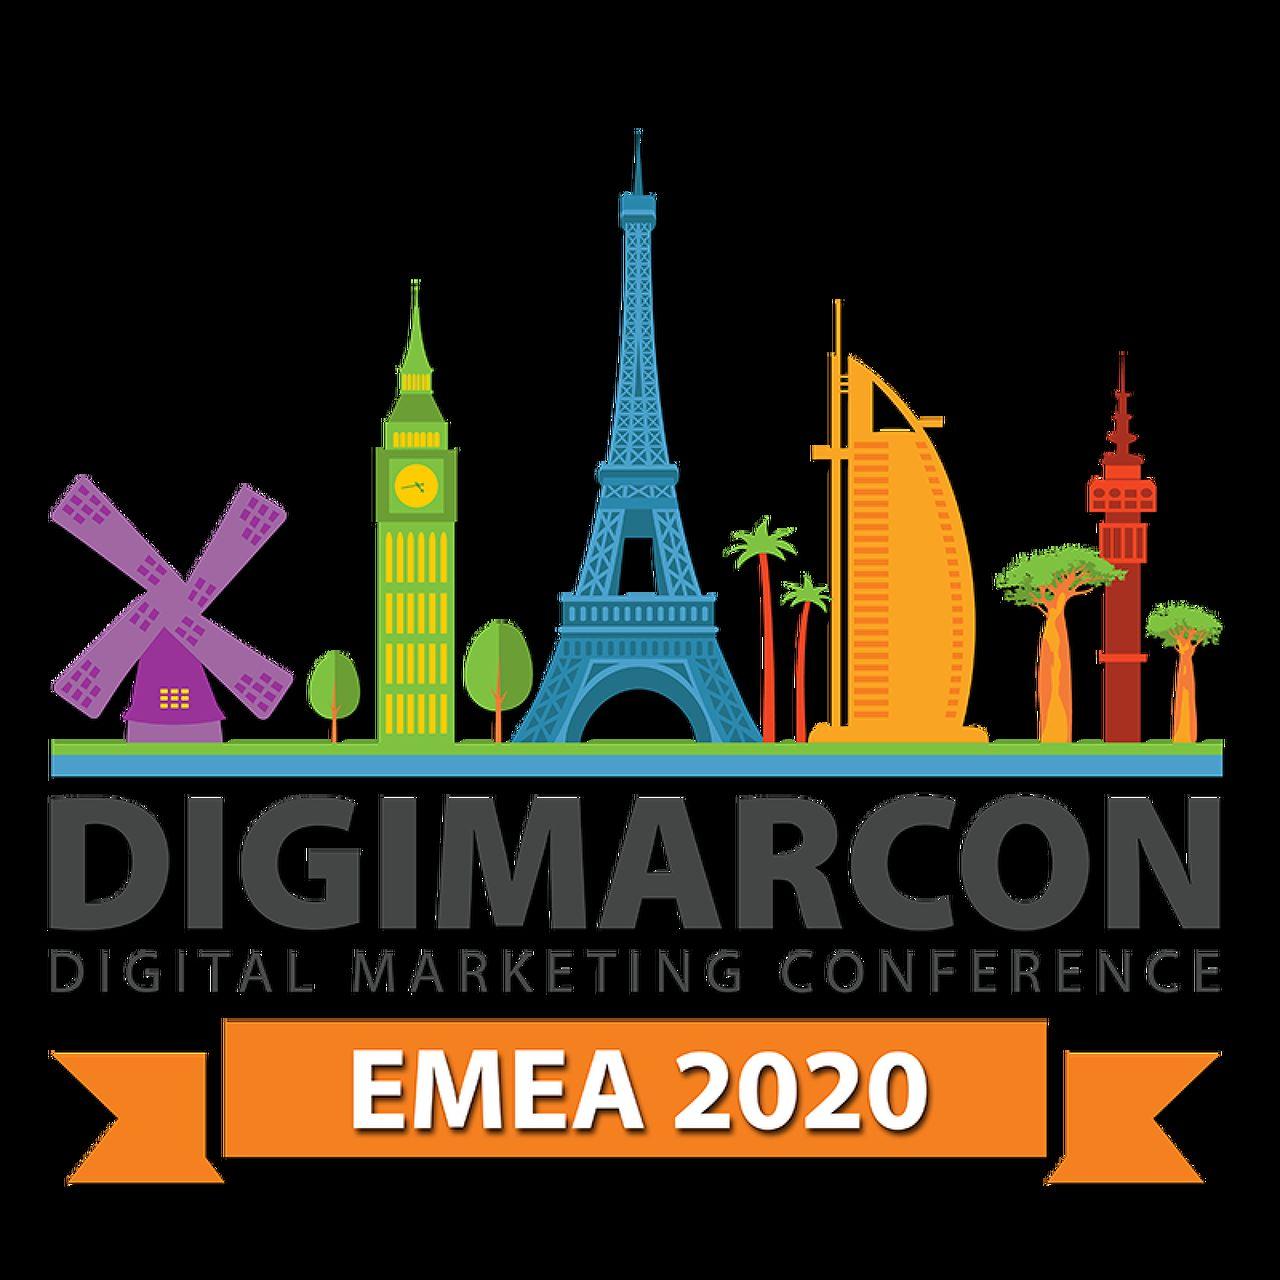 DigiMarCon EMEA 2020 - Digital Marketing Conference